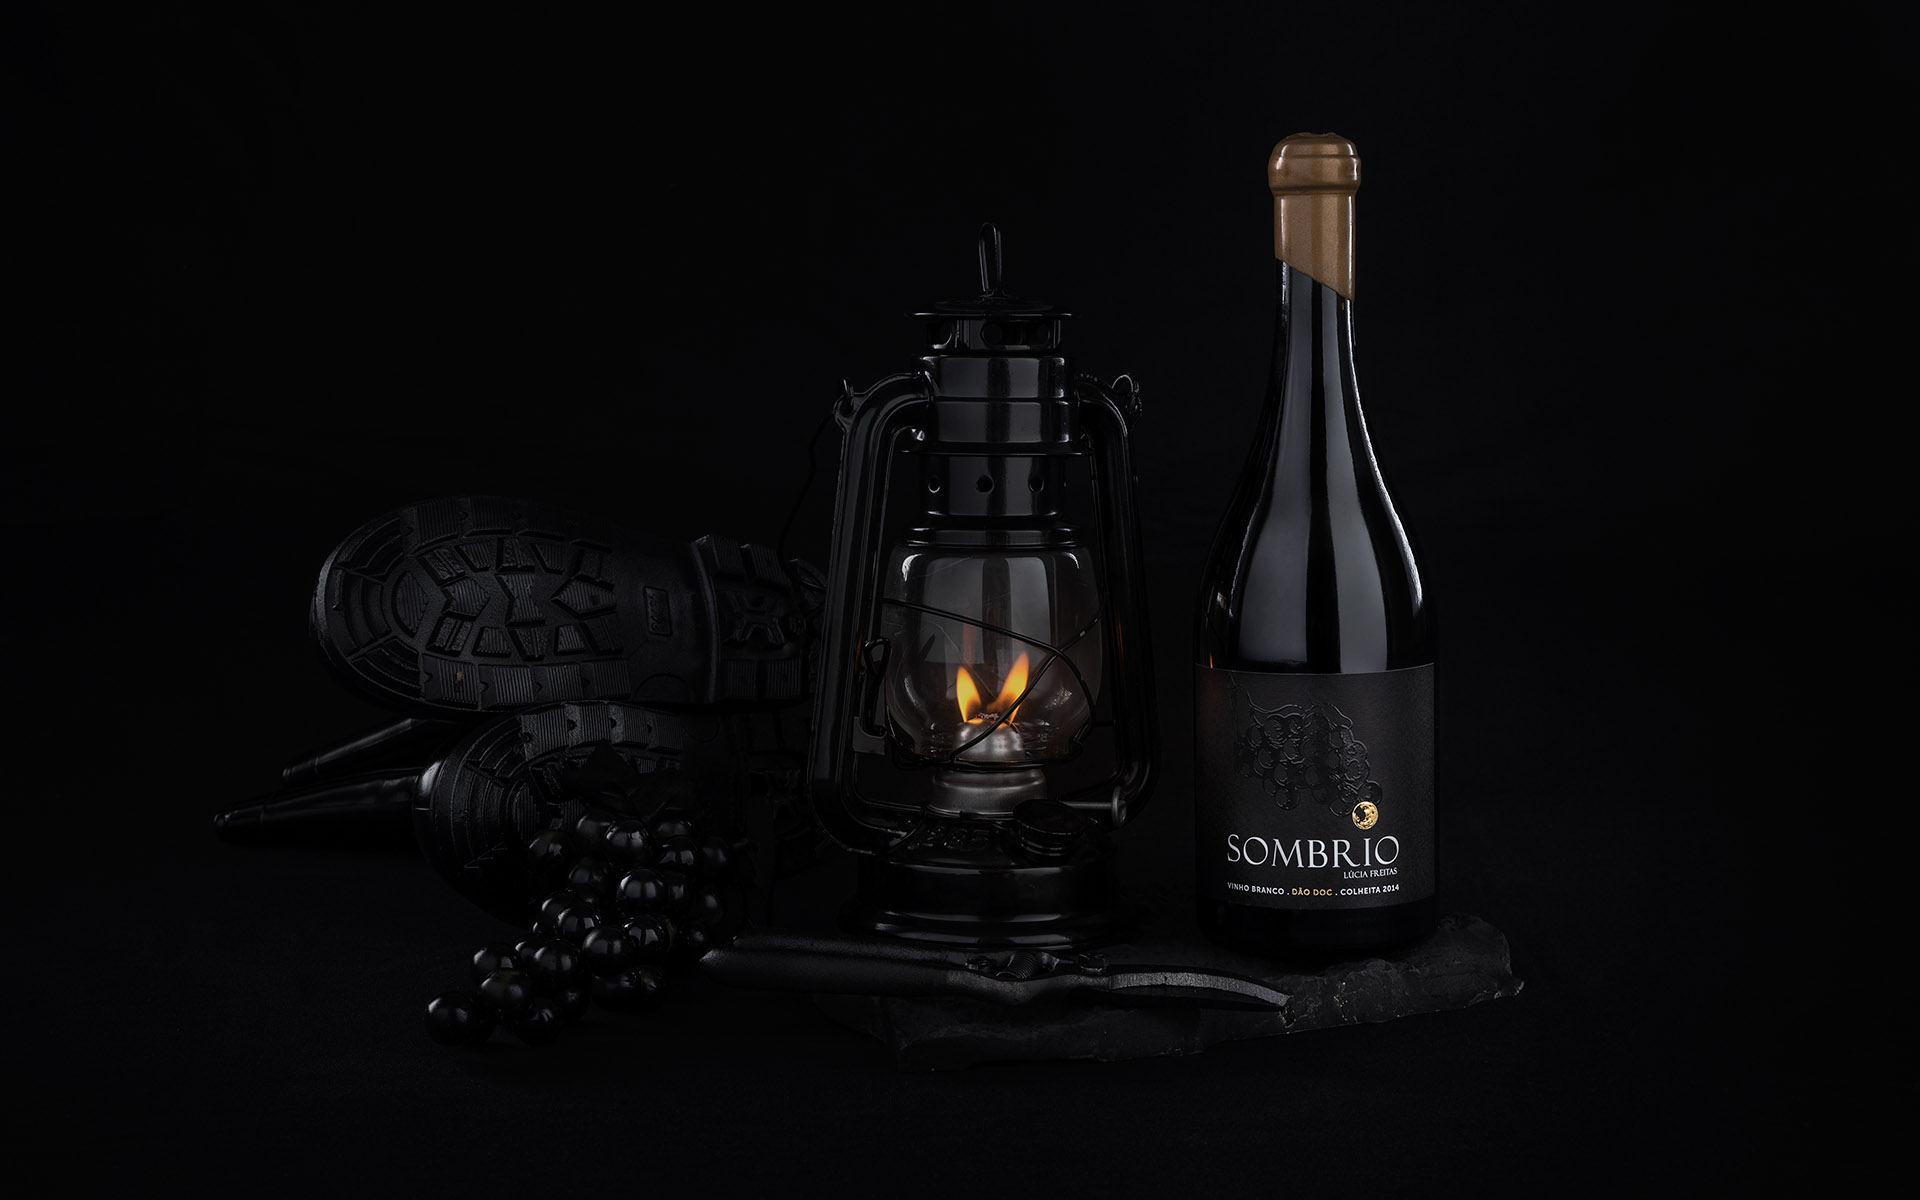 <p>Under the dark scenario of night Sombrio wine is revealed</p>